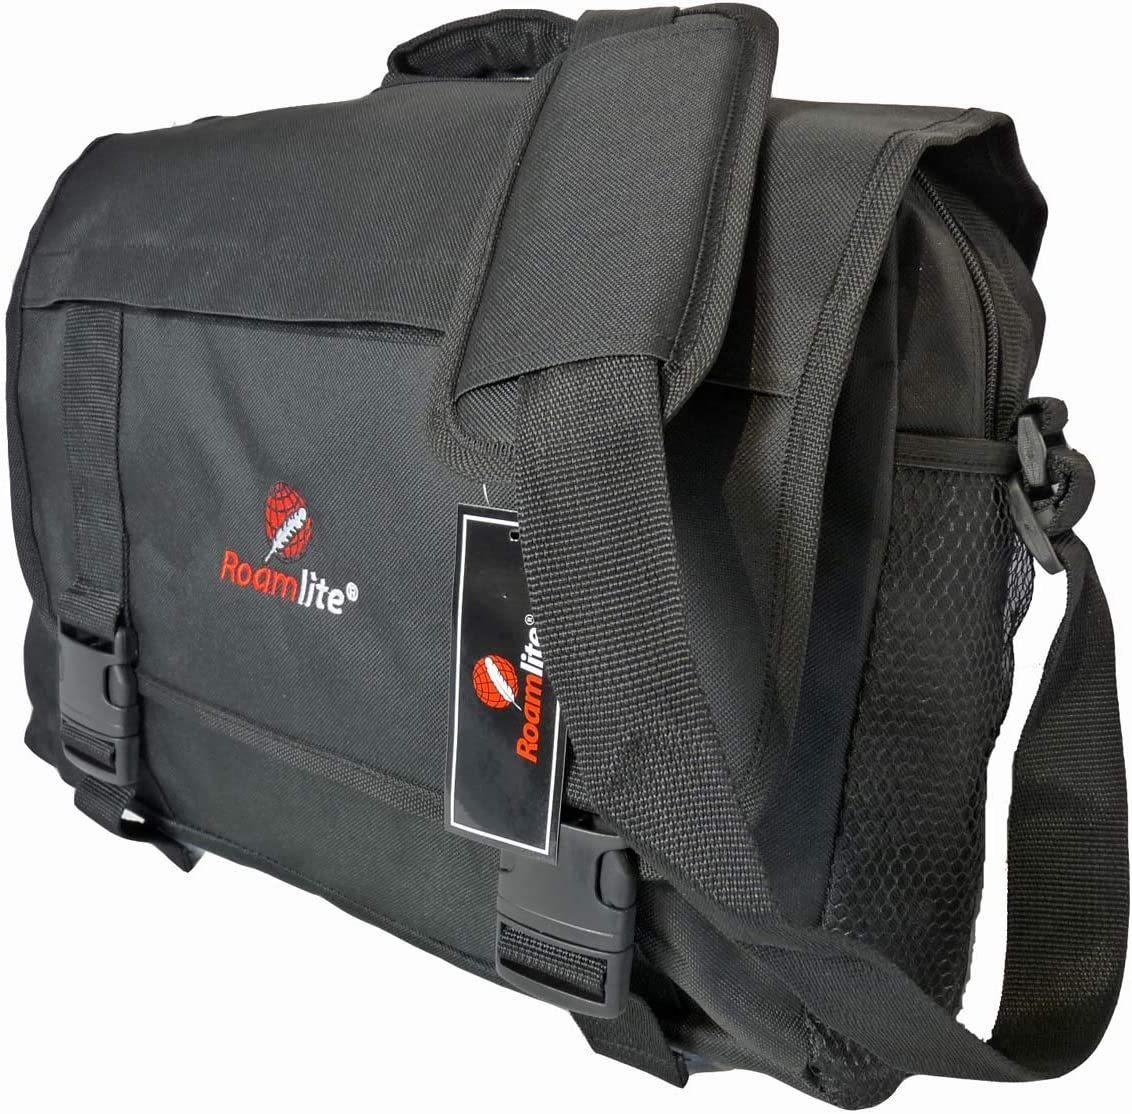 Roamlite /® Sac bandouli/ère noir - RL39 BAG Noir